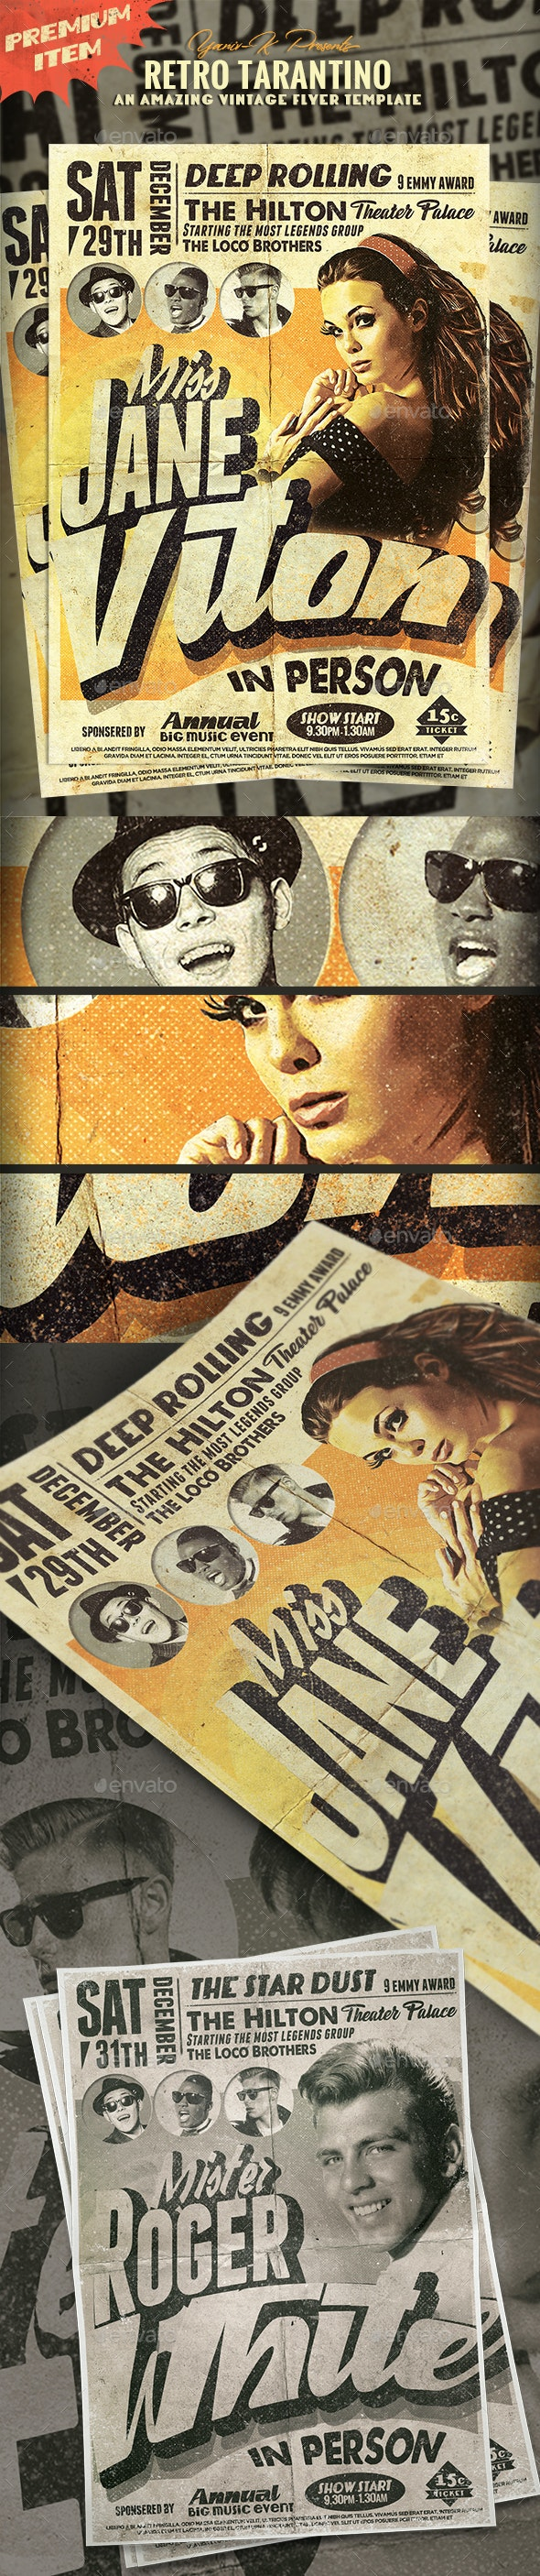 Retro Tarantino poster - Flyers Print Templates